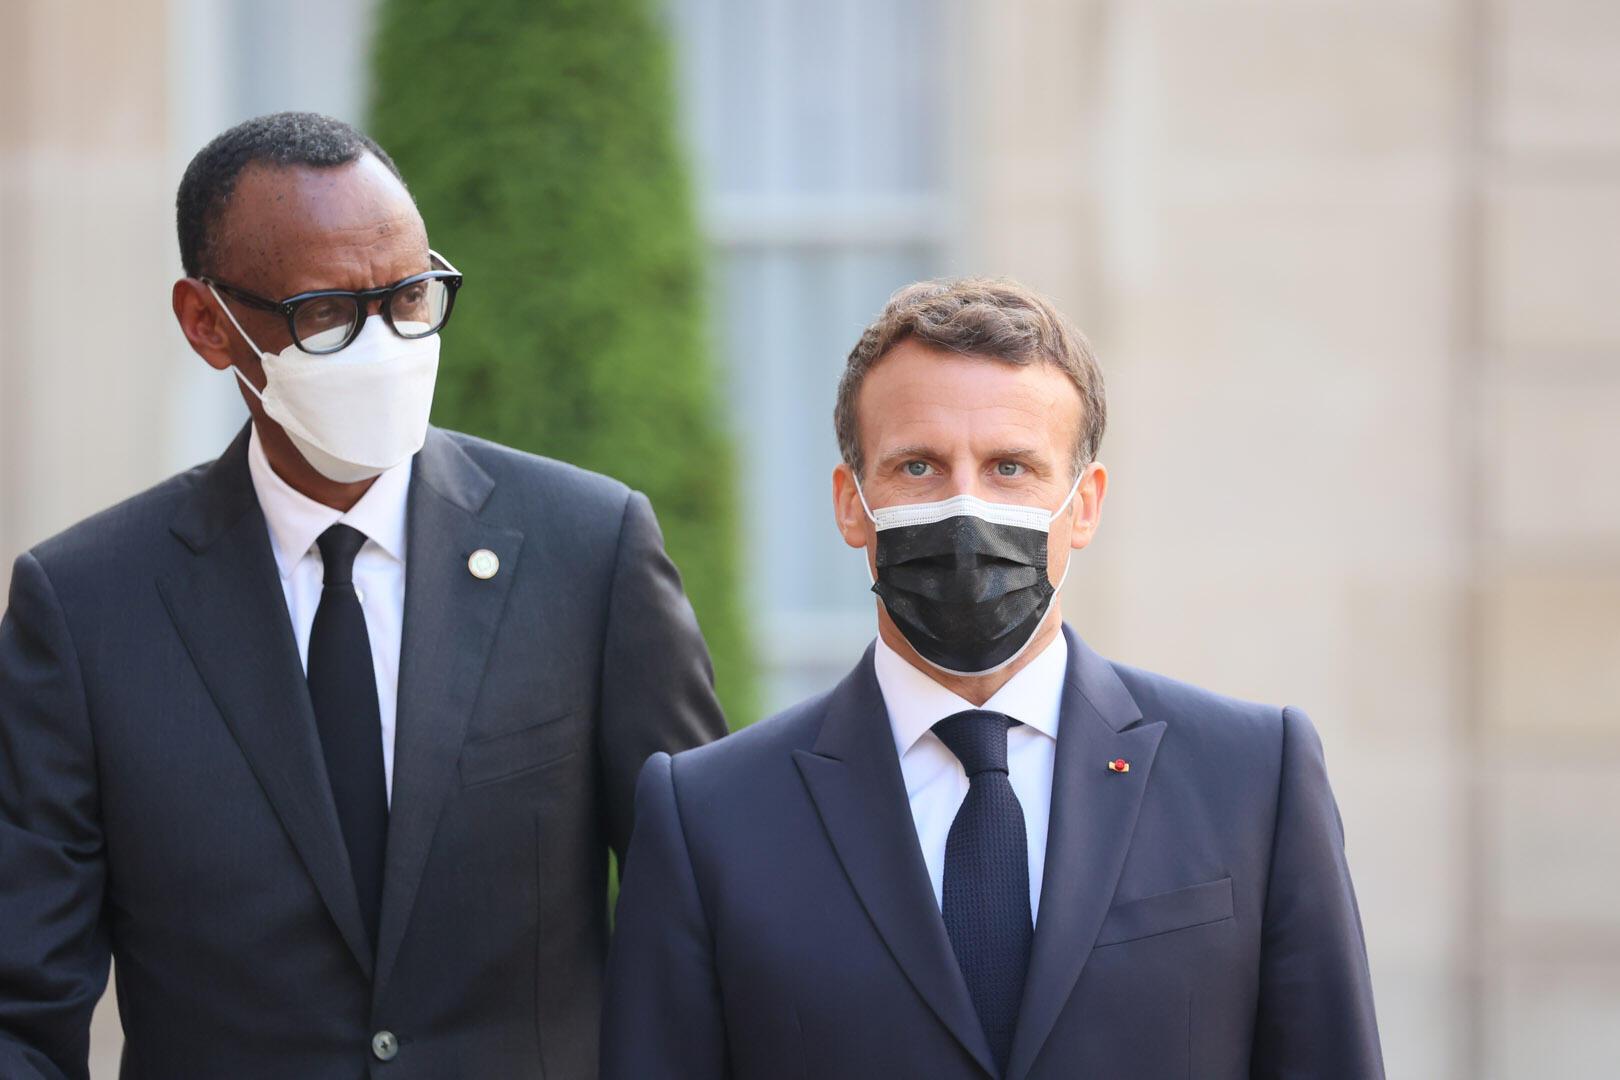 France - Élysée - Emmanuel Macron - Paul Kagame - MACRON-KAGAME_PRW_4071